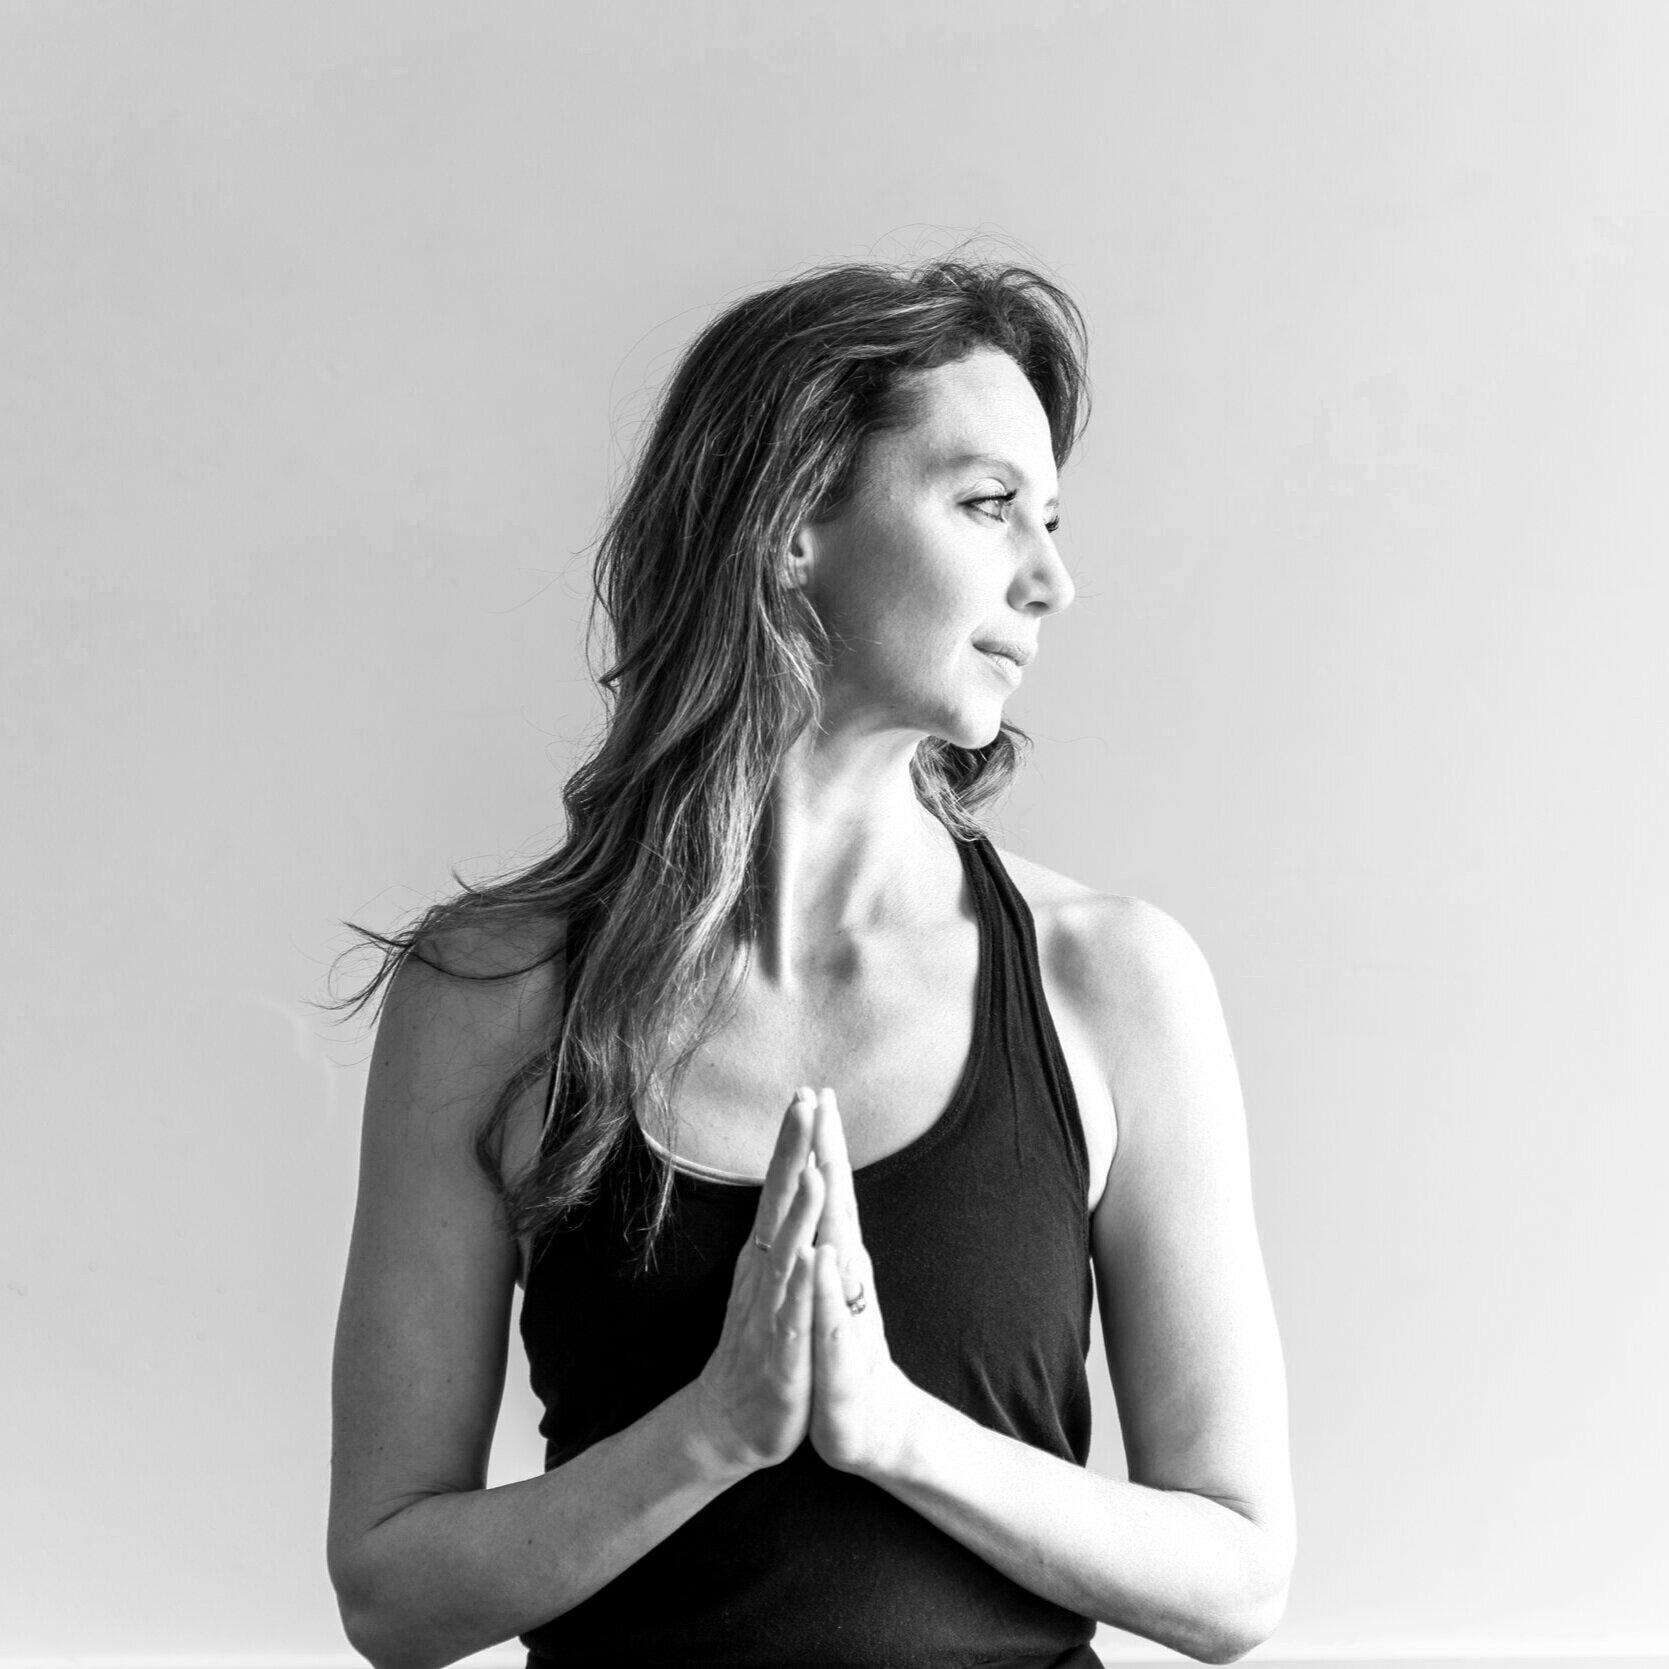 Julia-Rose+Gribble+Yoga